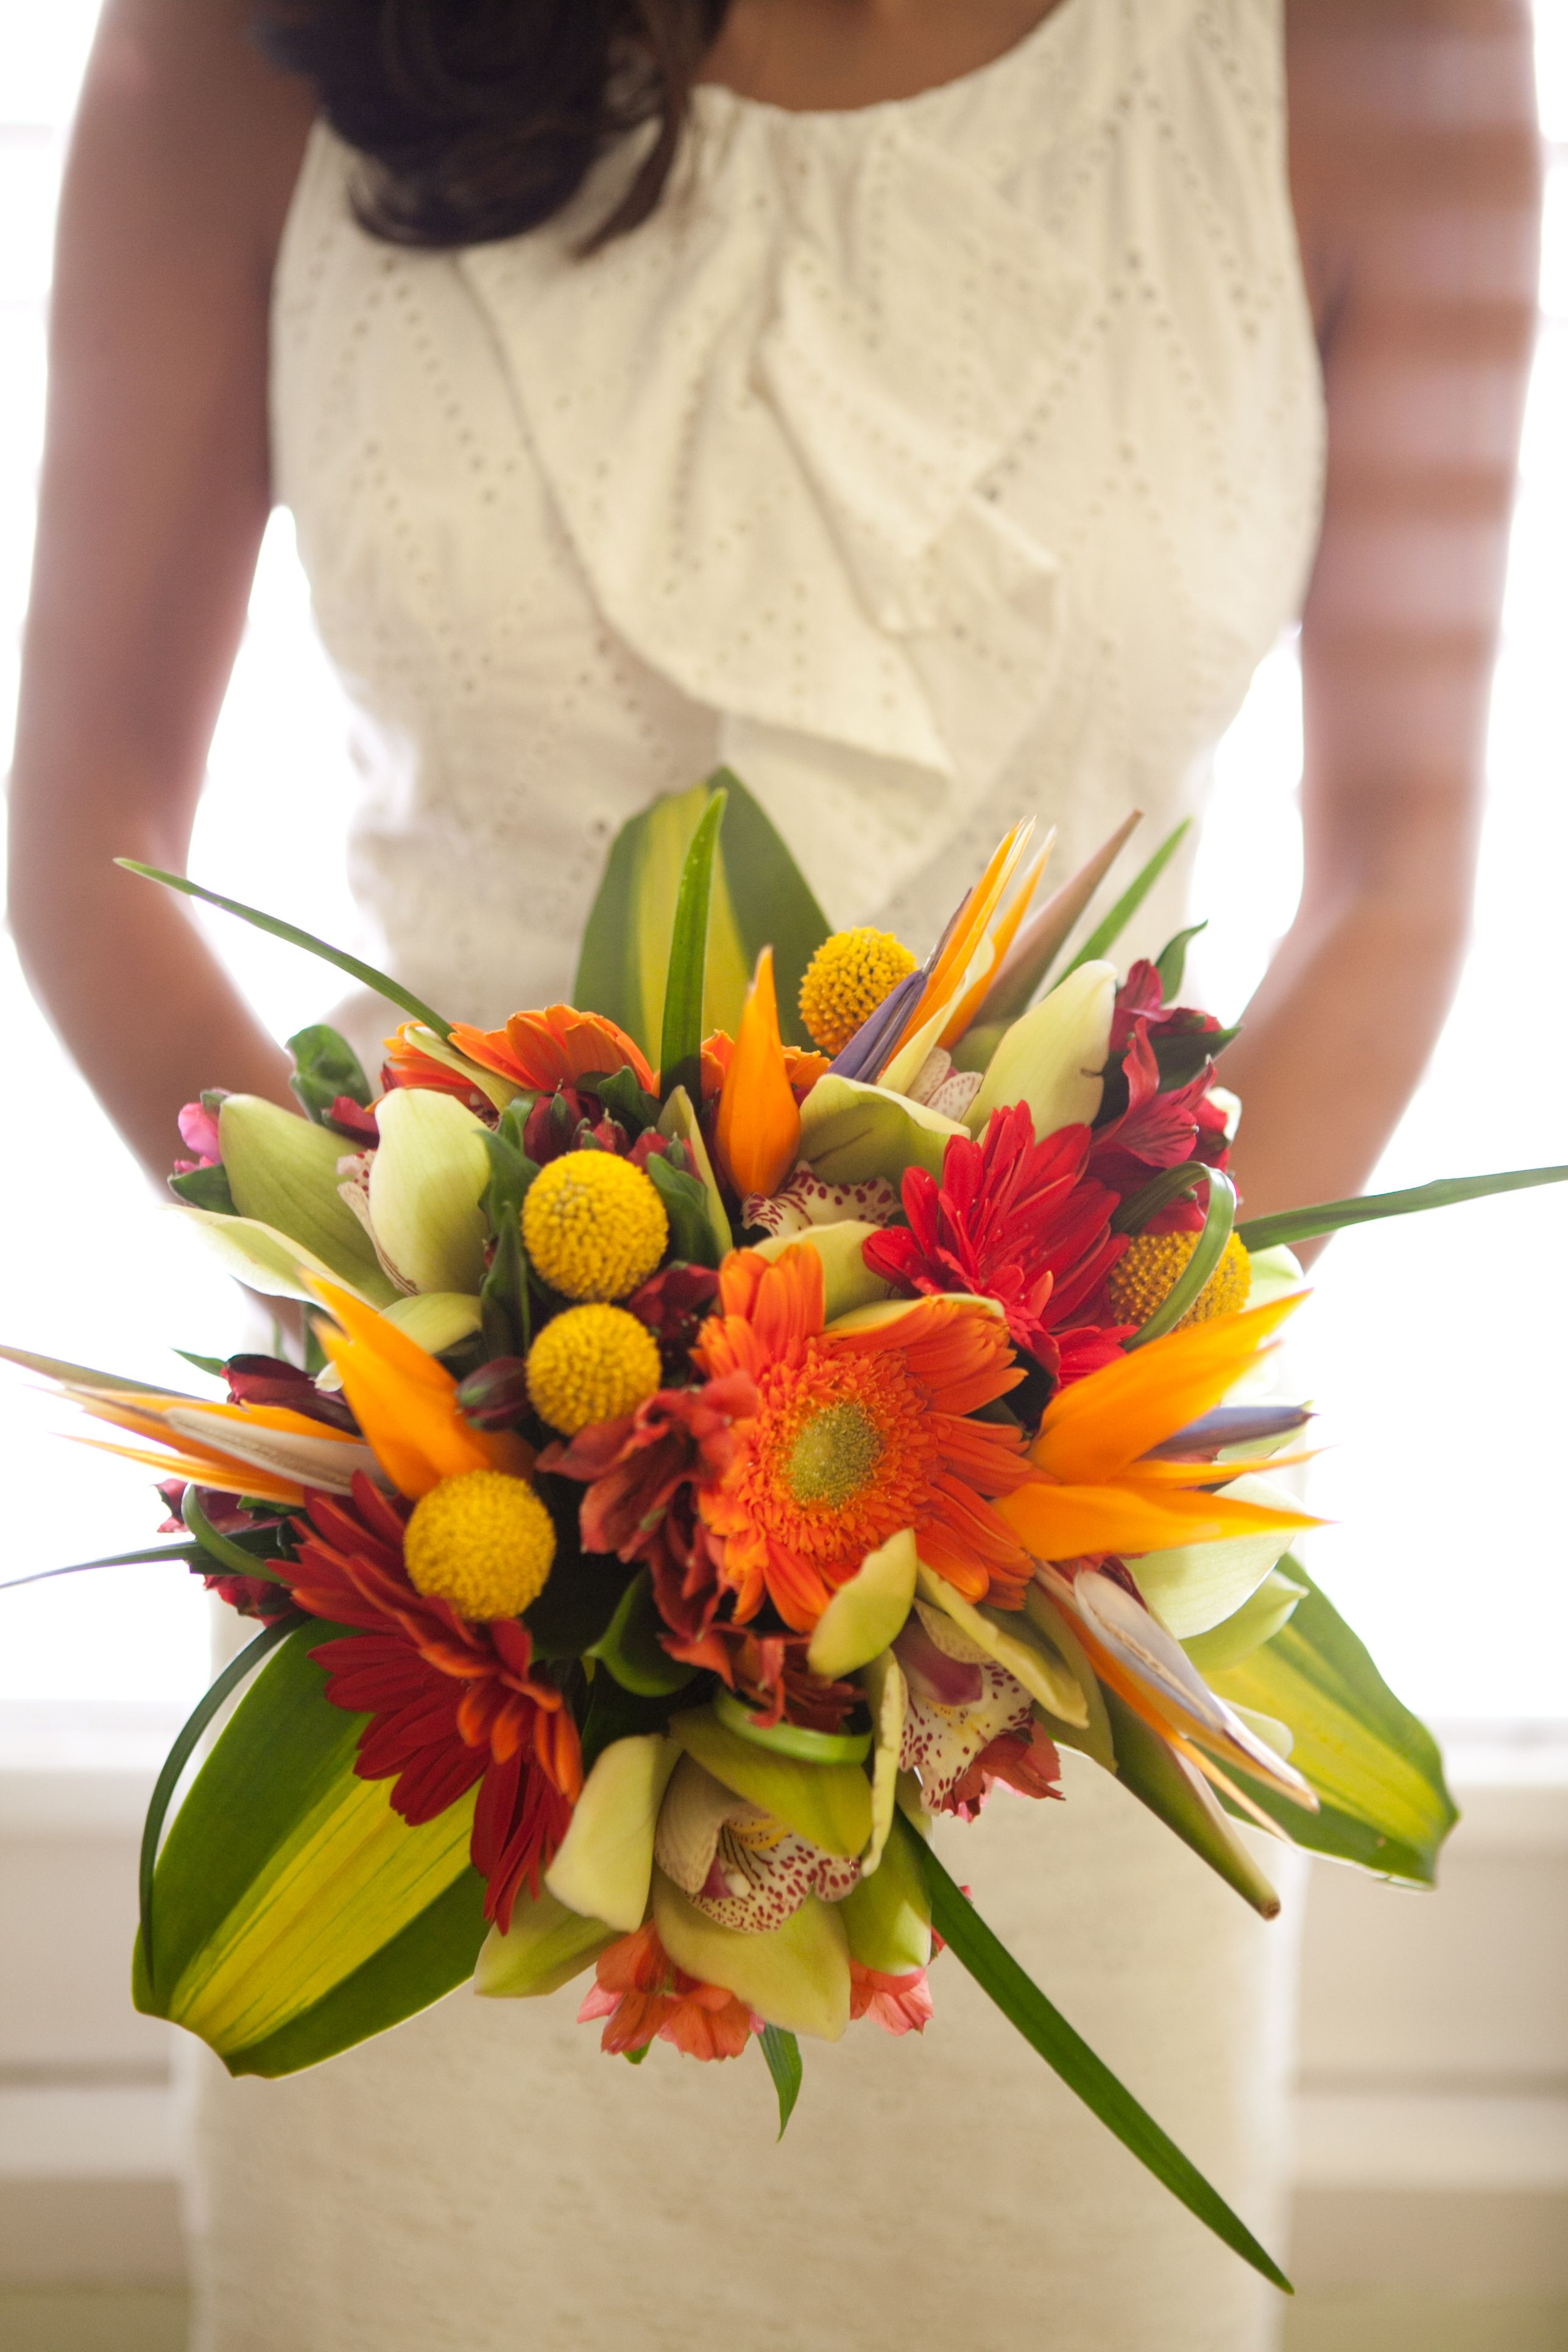 Orange and yellow bouquet de fleurs de mariage wedding flowers orange and yellow bouquet de fleurs de mariage wedding flowers orangebouquet orangewedding izmirmasajfo